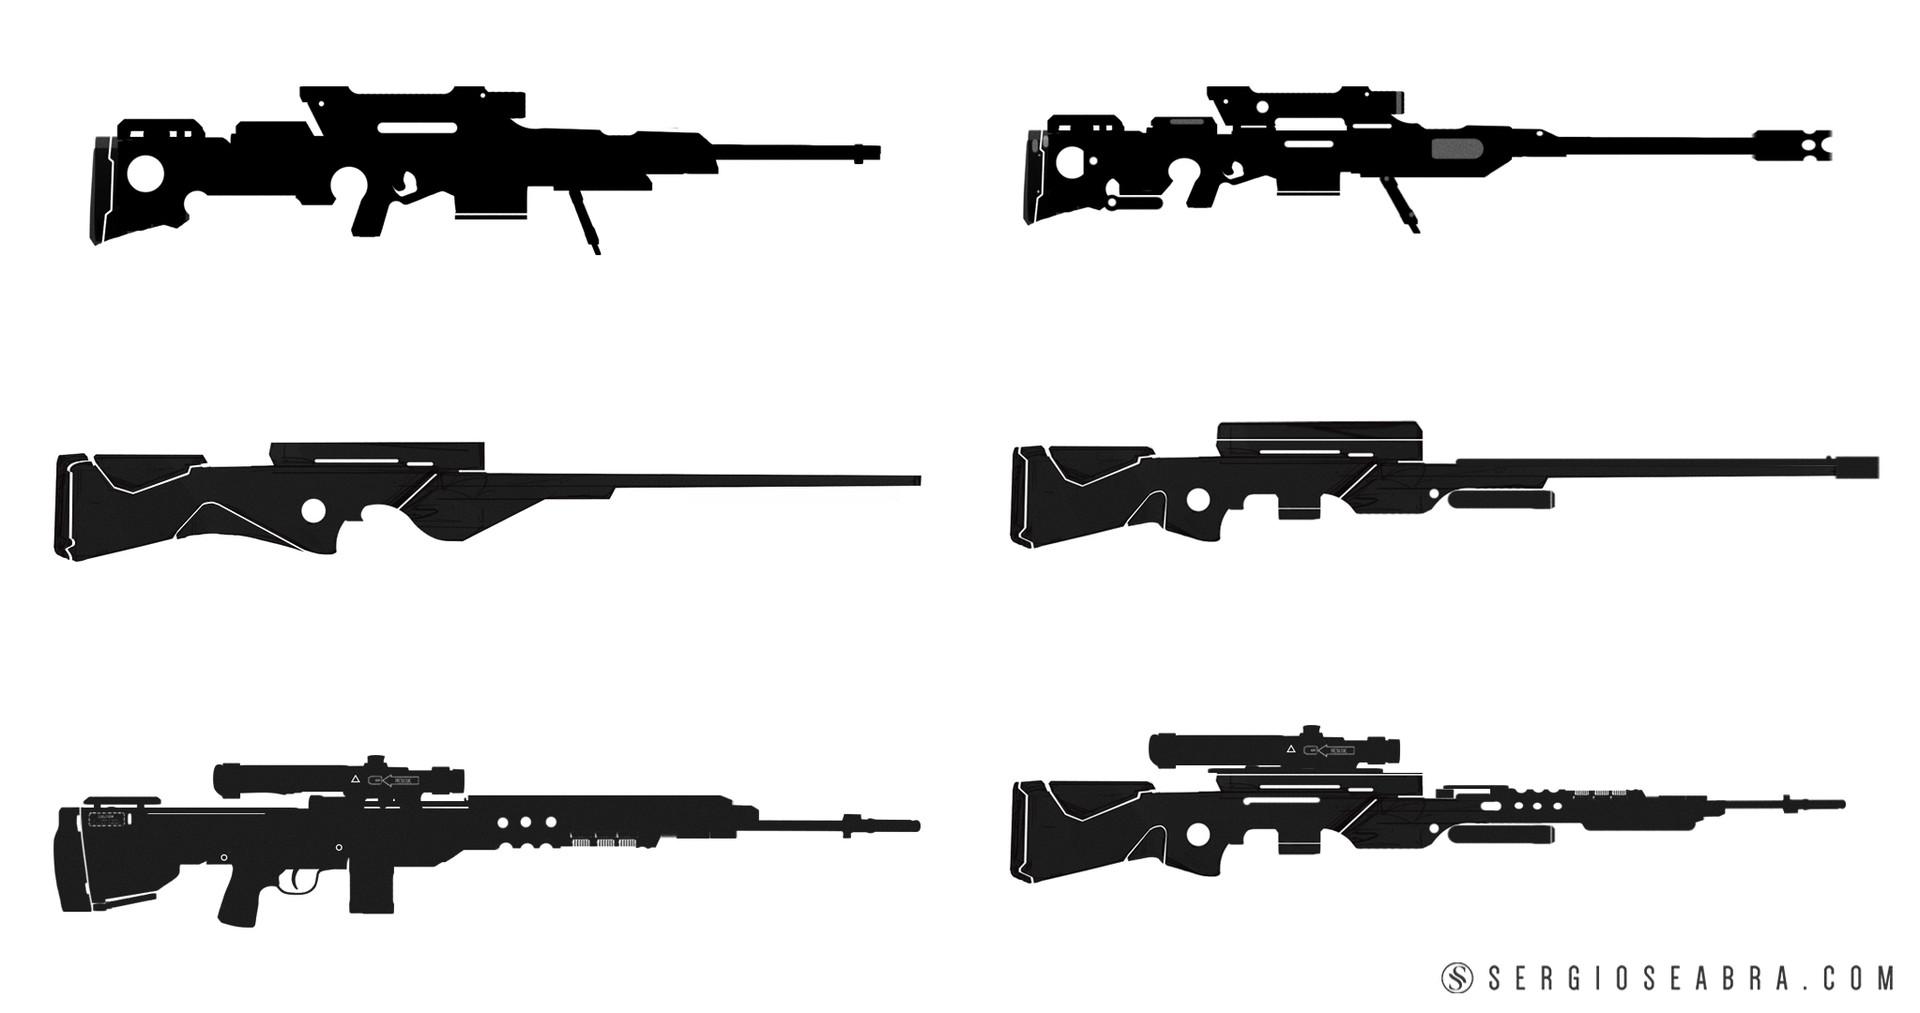 Sergio seabra 20180205 prop phantom twins sniper rifle layouts5